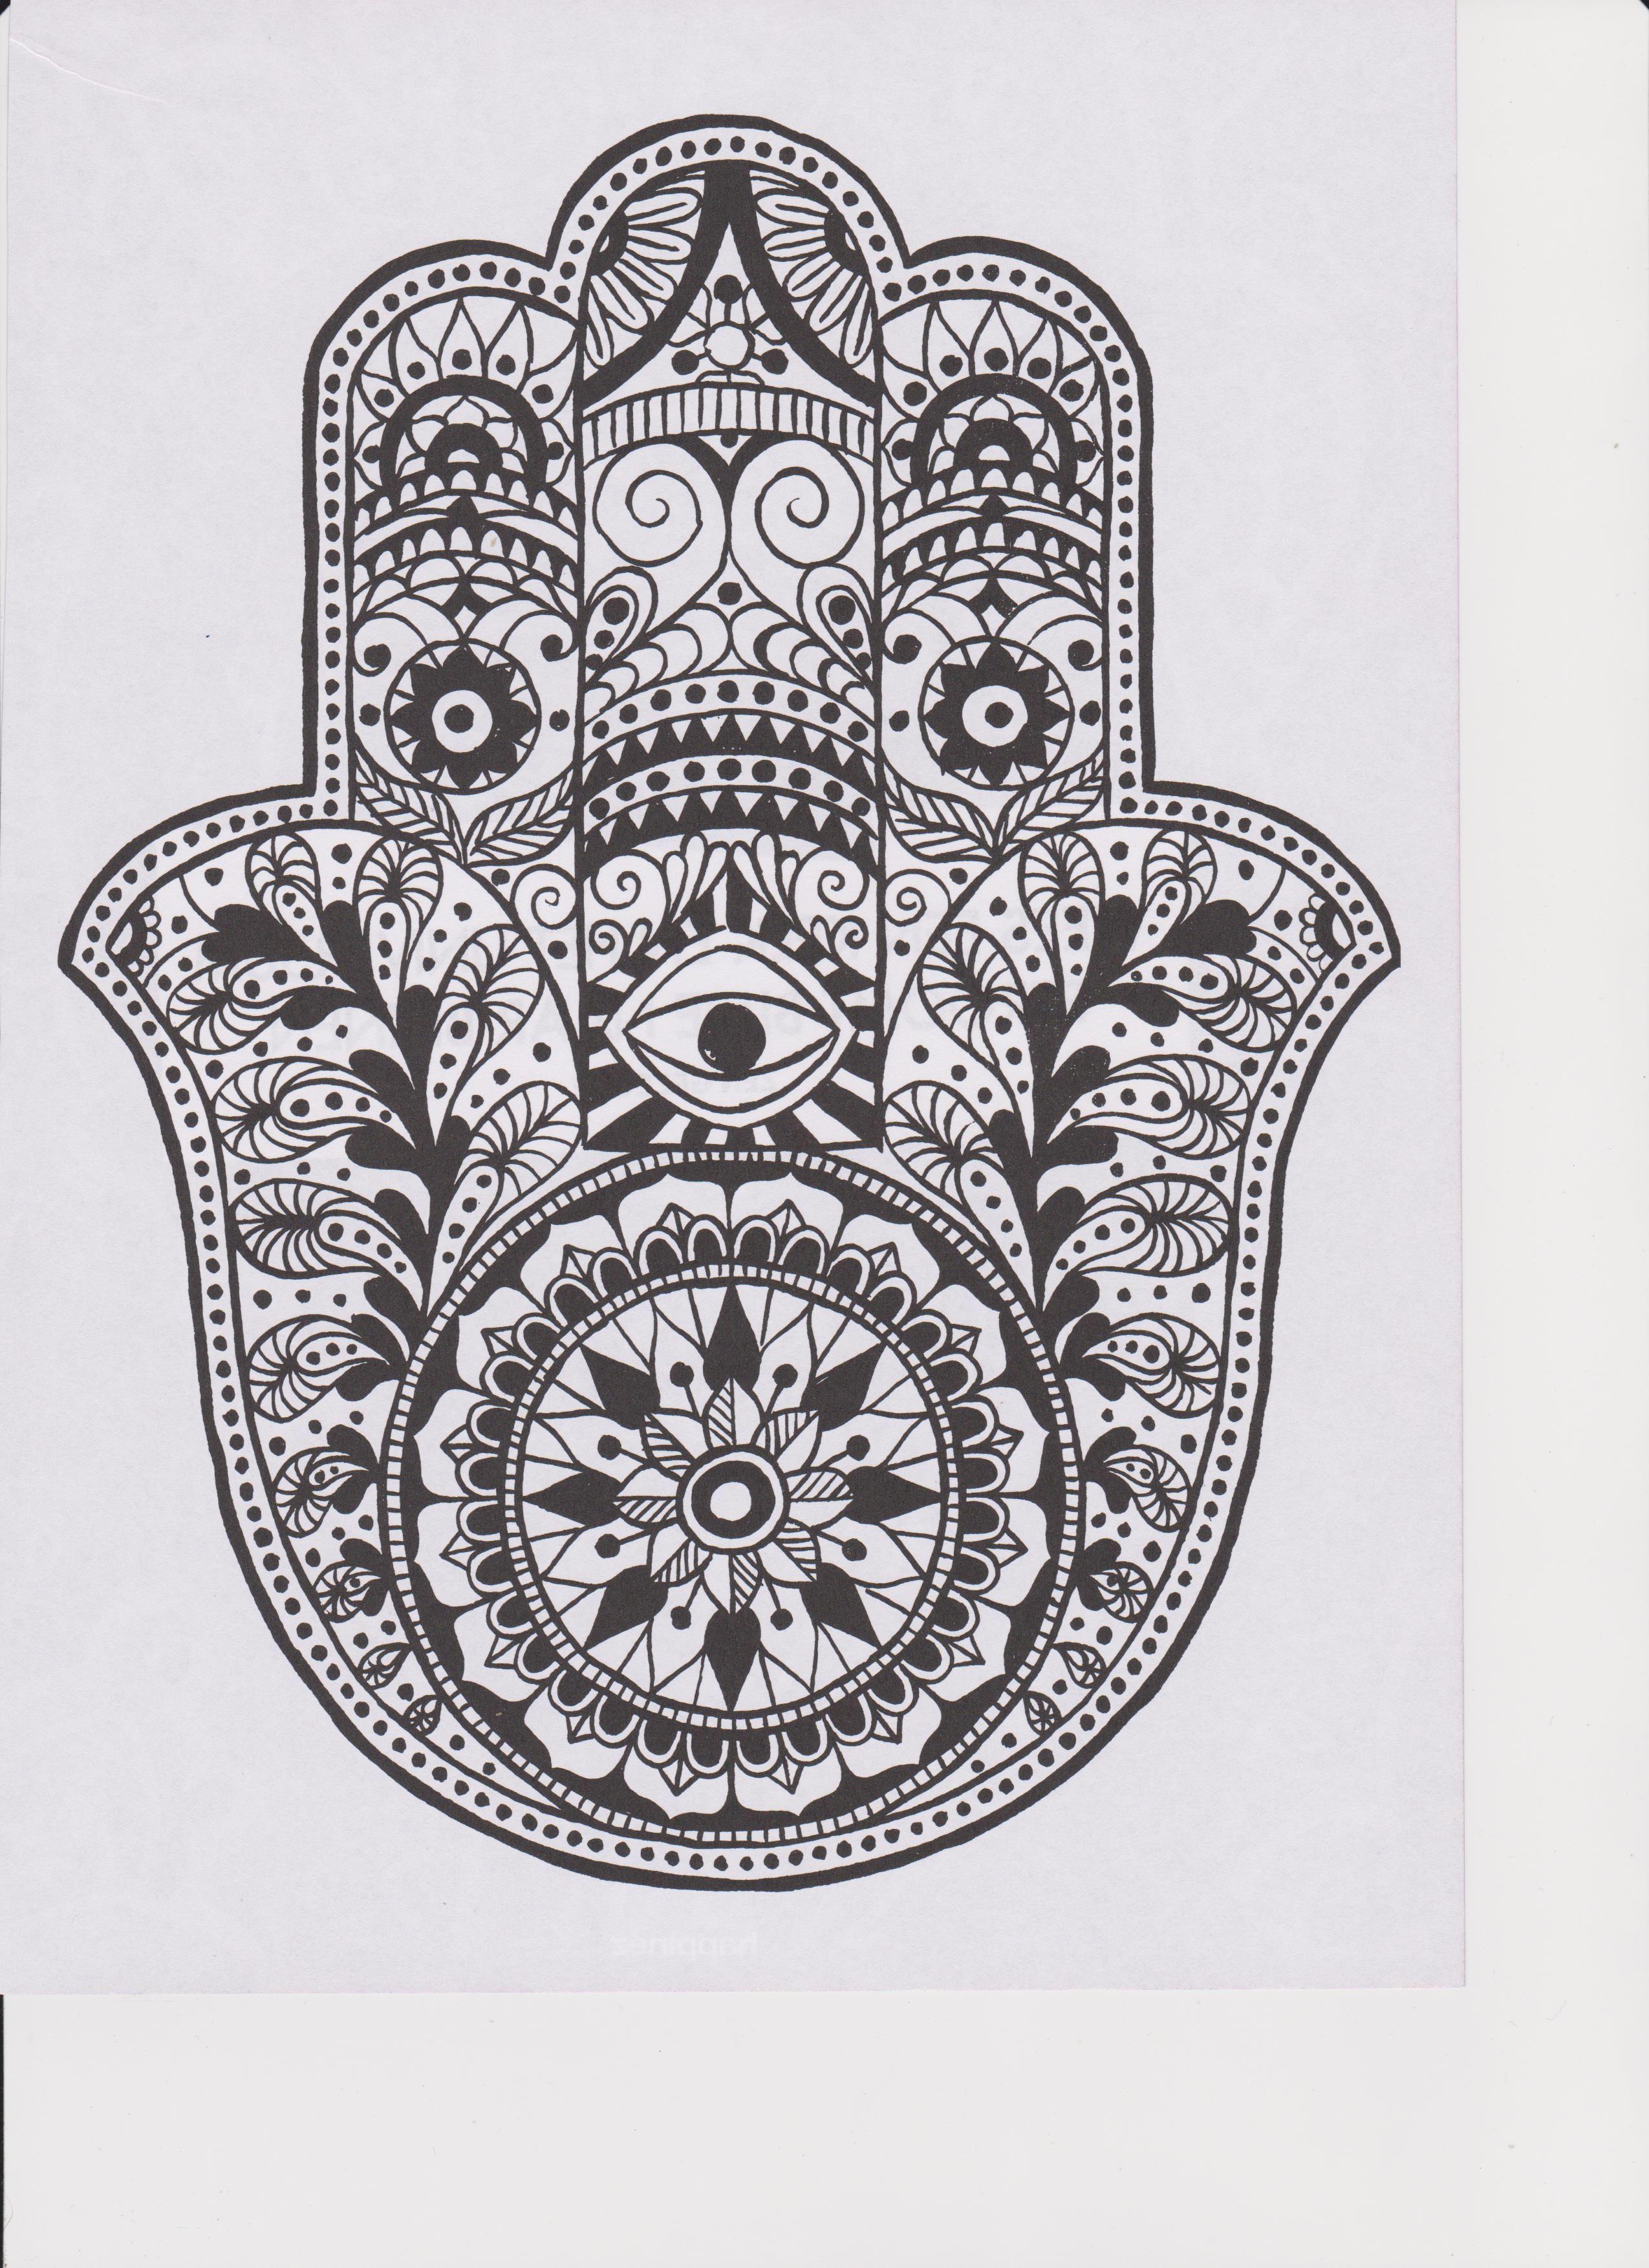 Pin de Danielle Wright en coloring pages | Pinterest | Mano fatima